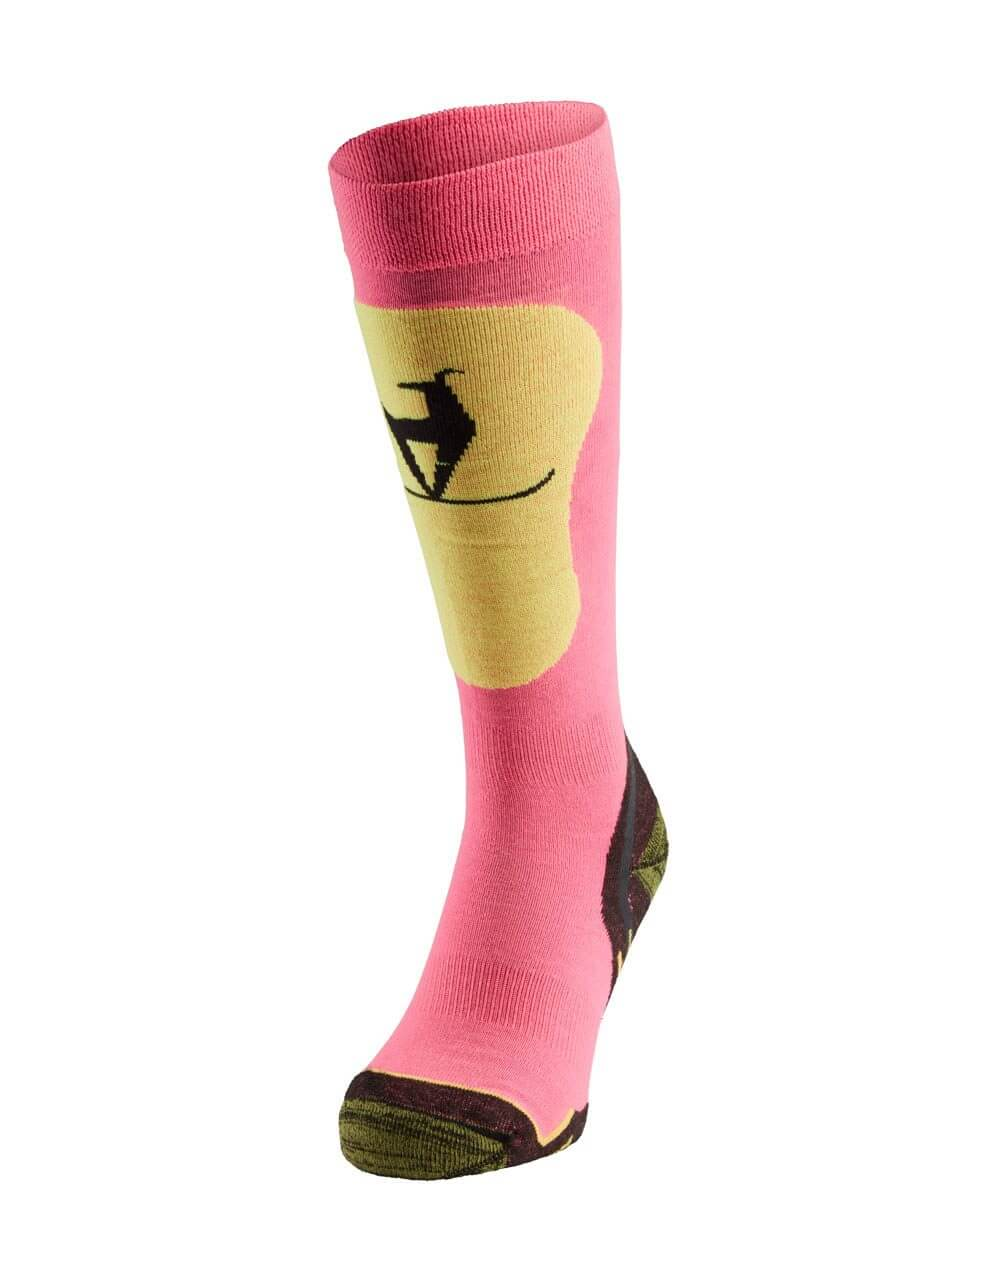 726038232 Skisocken Damen neon pink